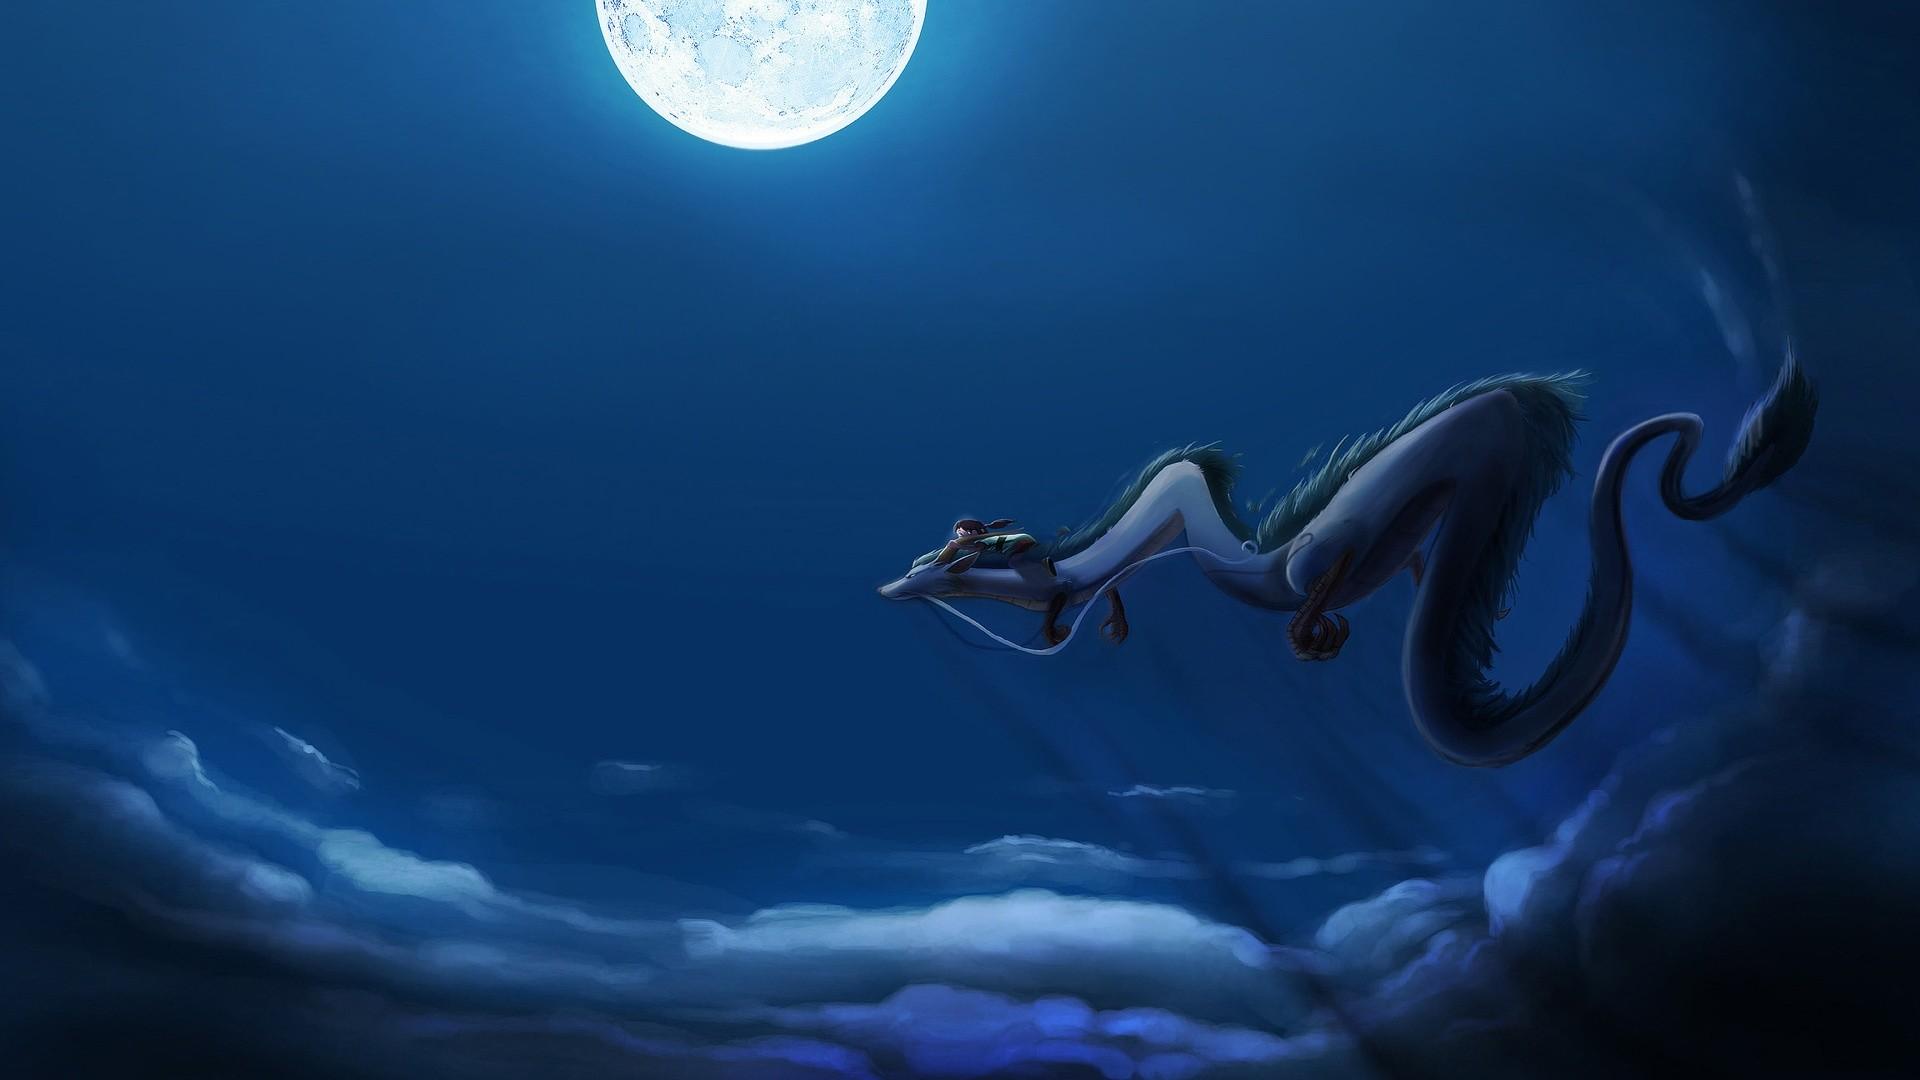 Dragons Desktop Wallpaper